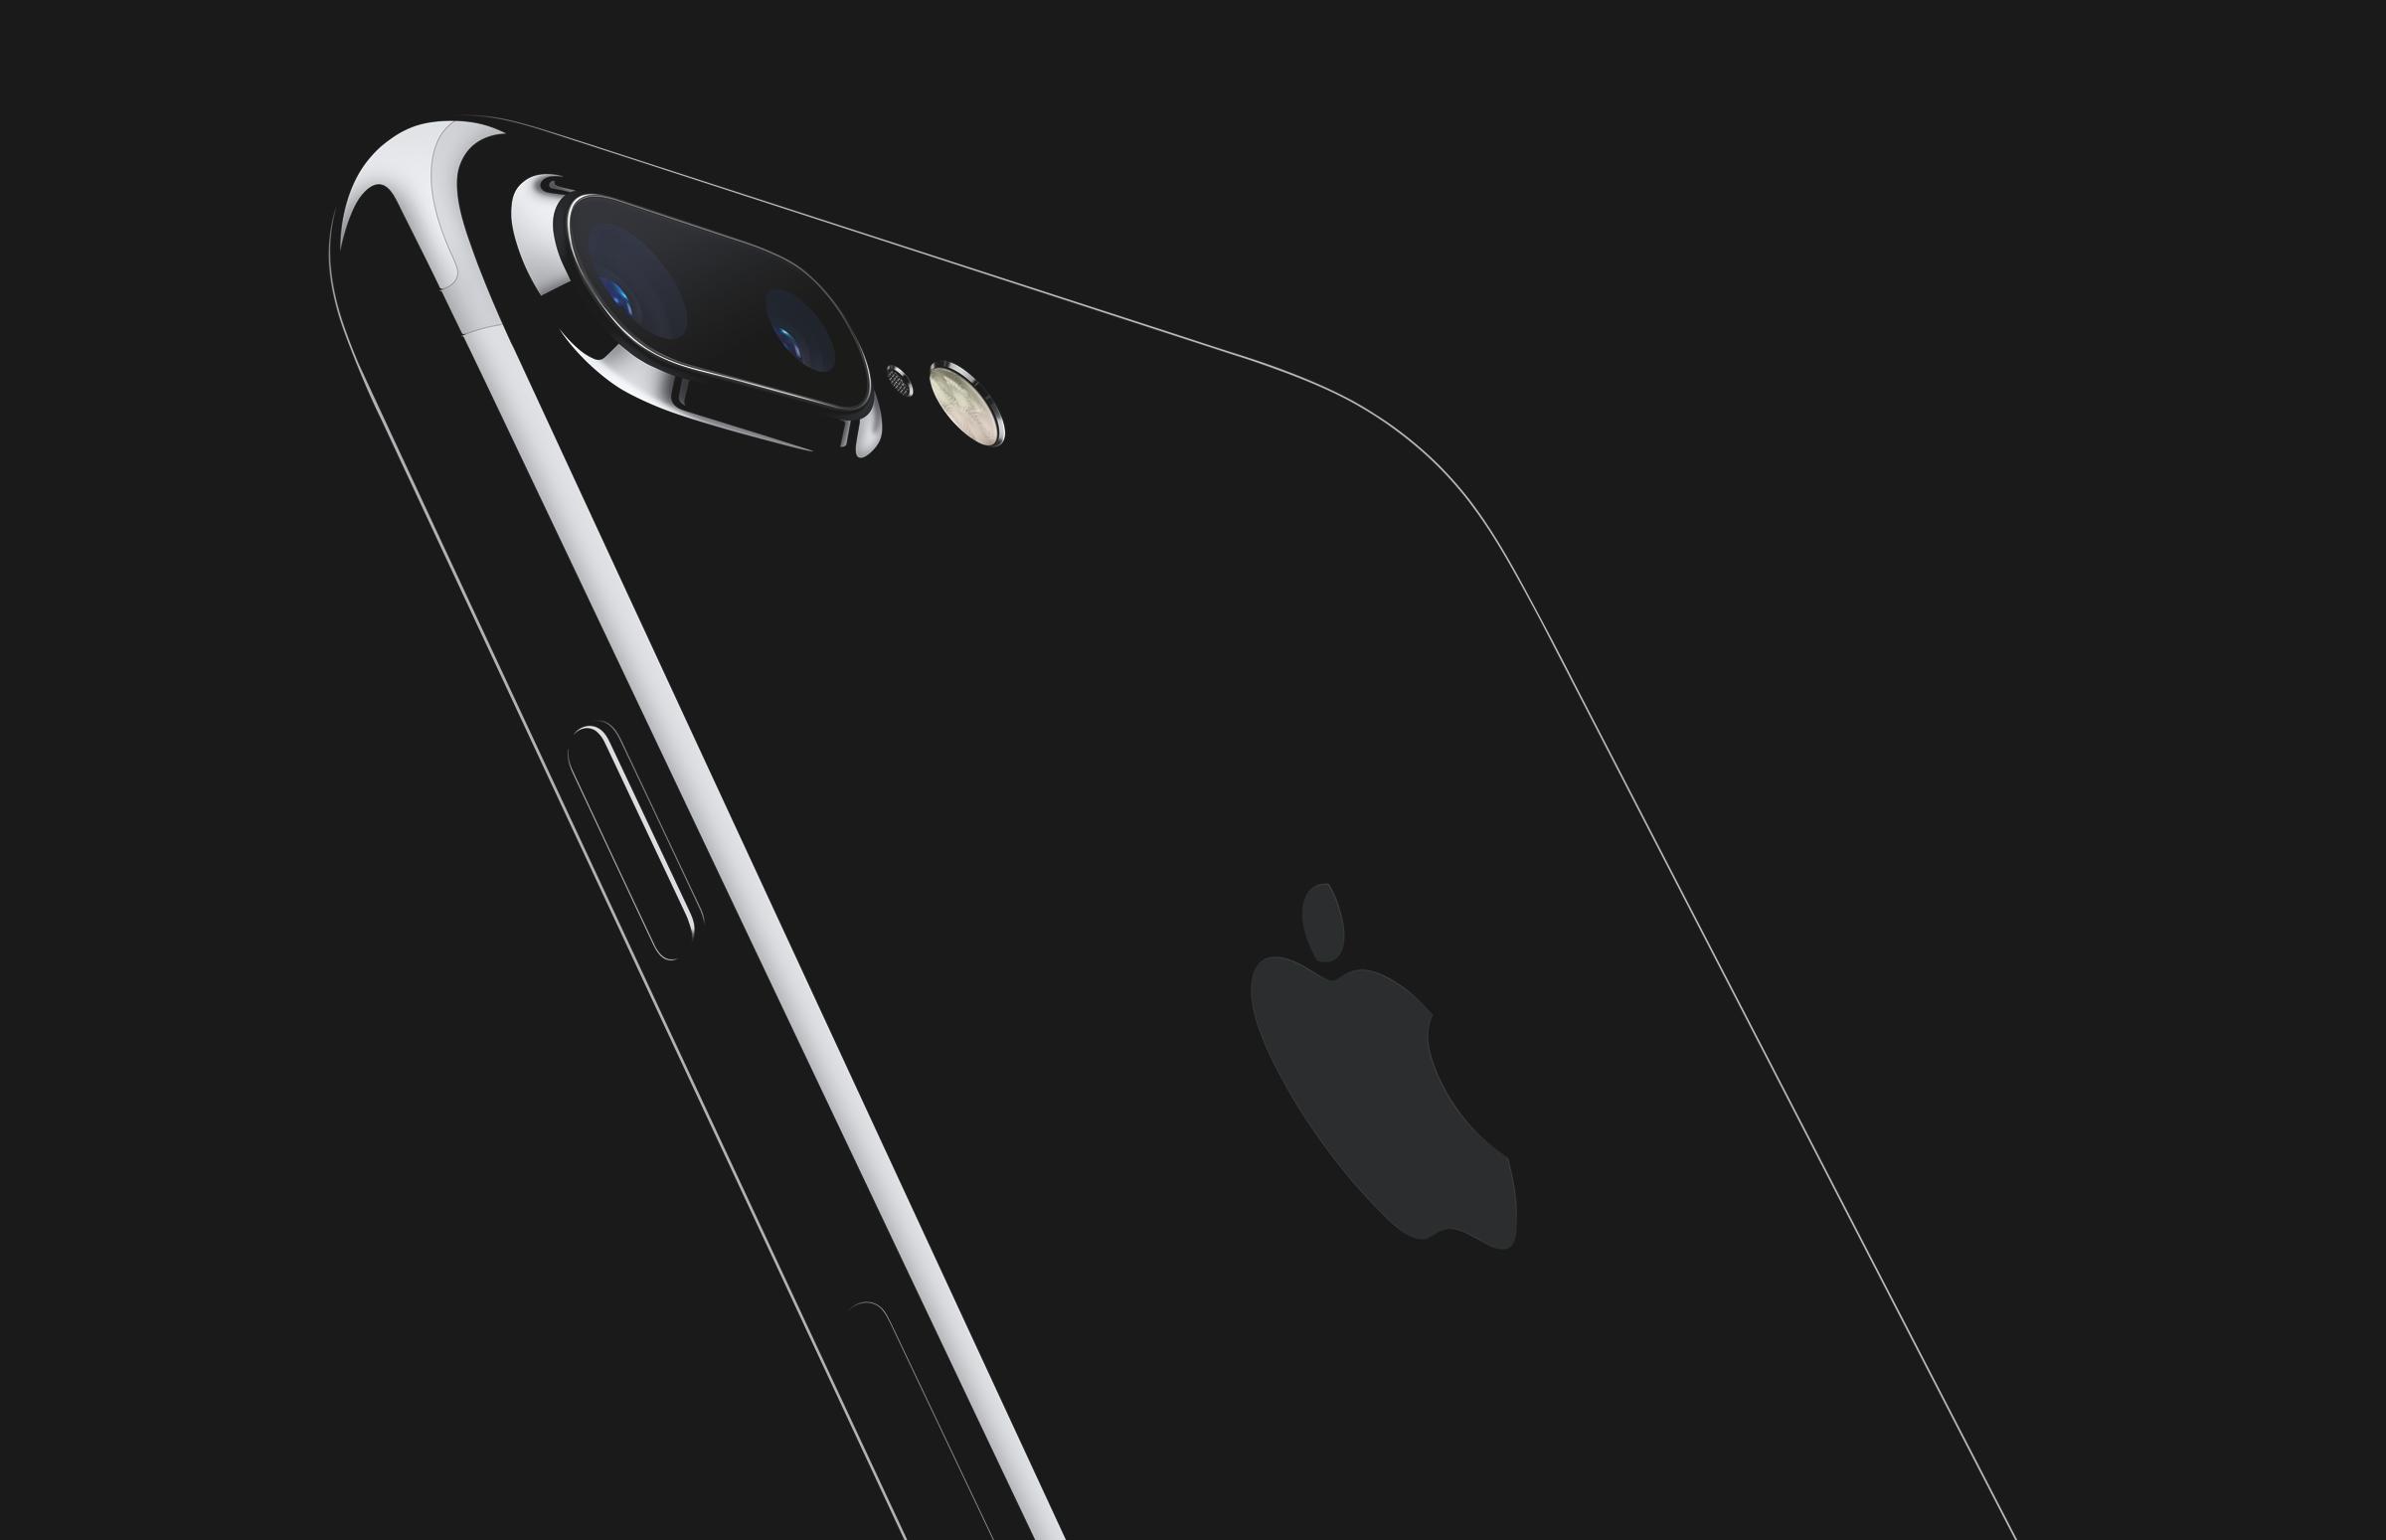 A shot of Apple's jet black iPhone